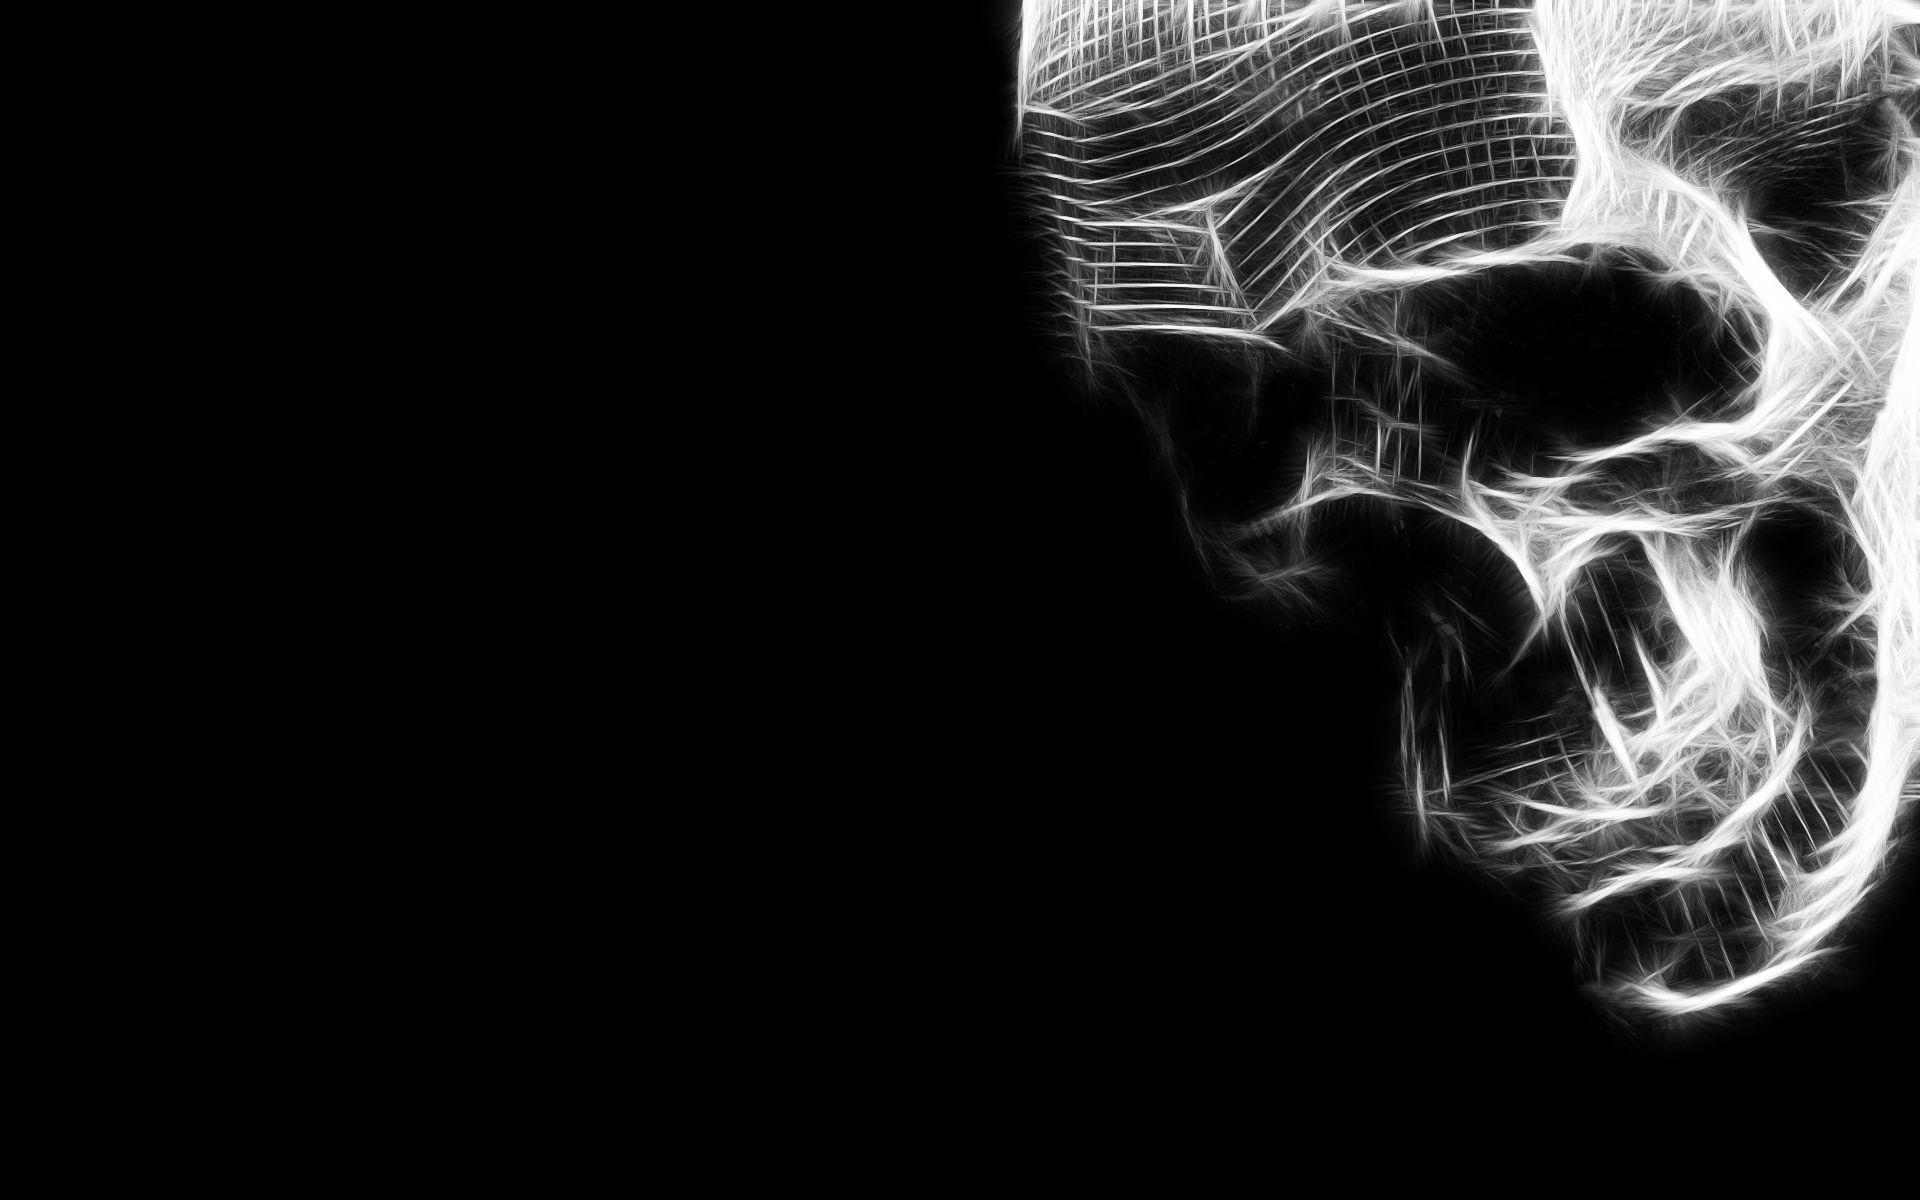 Full Hd Skull Wallpapers 1920x1200